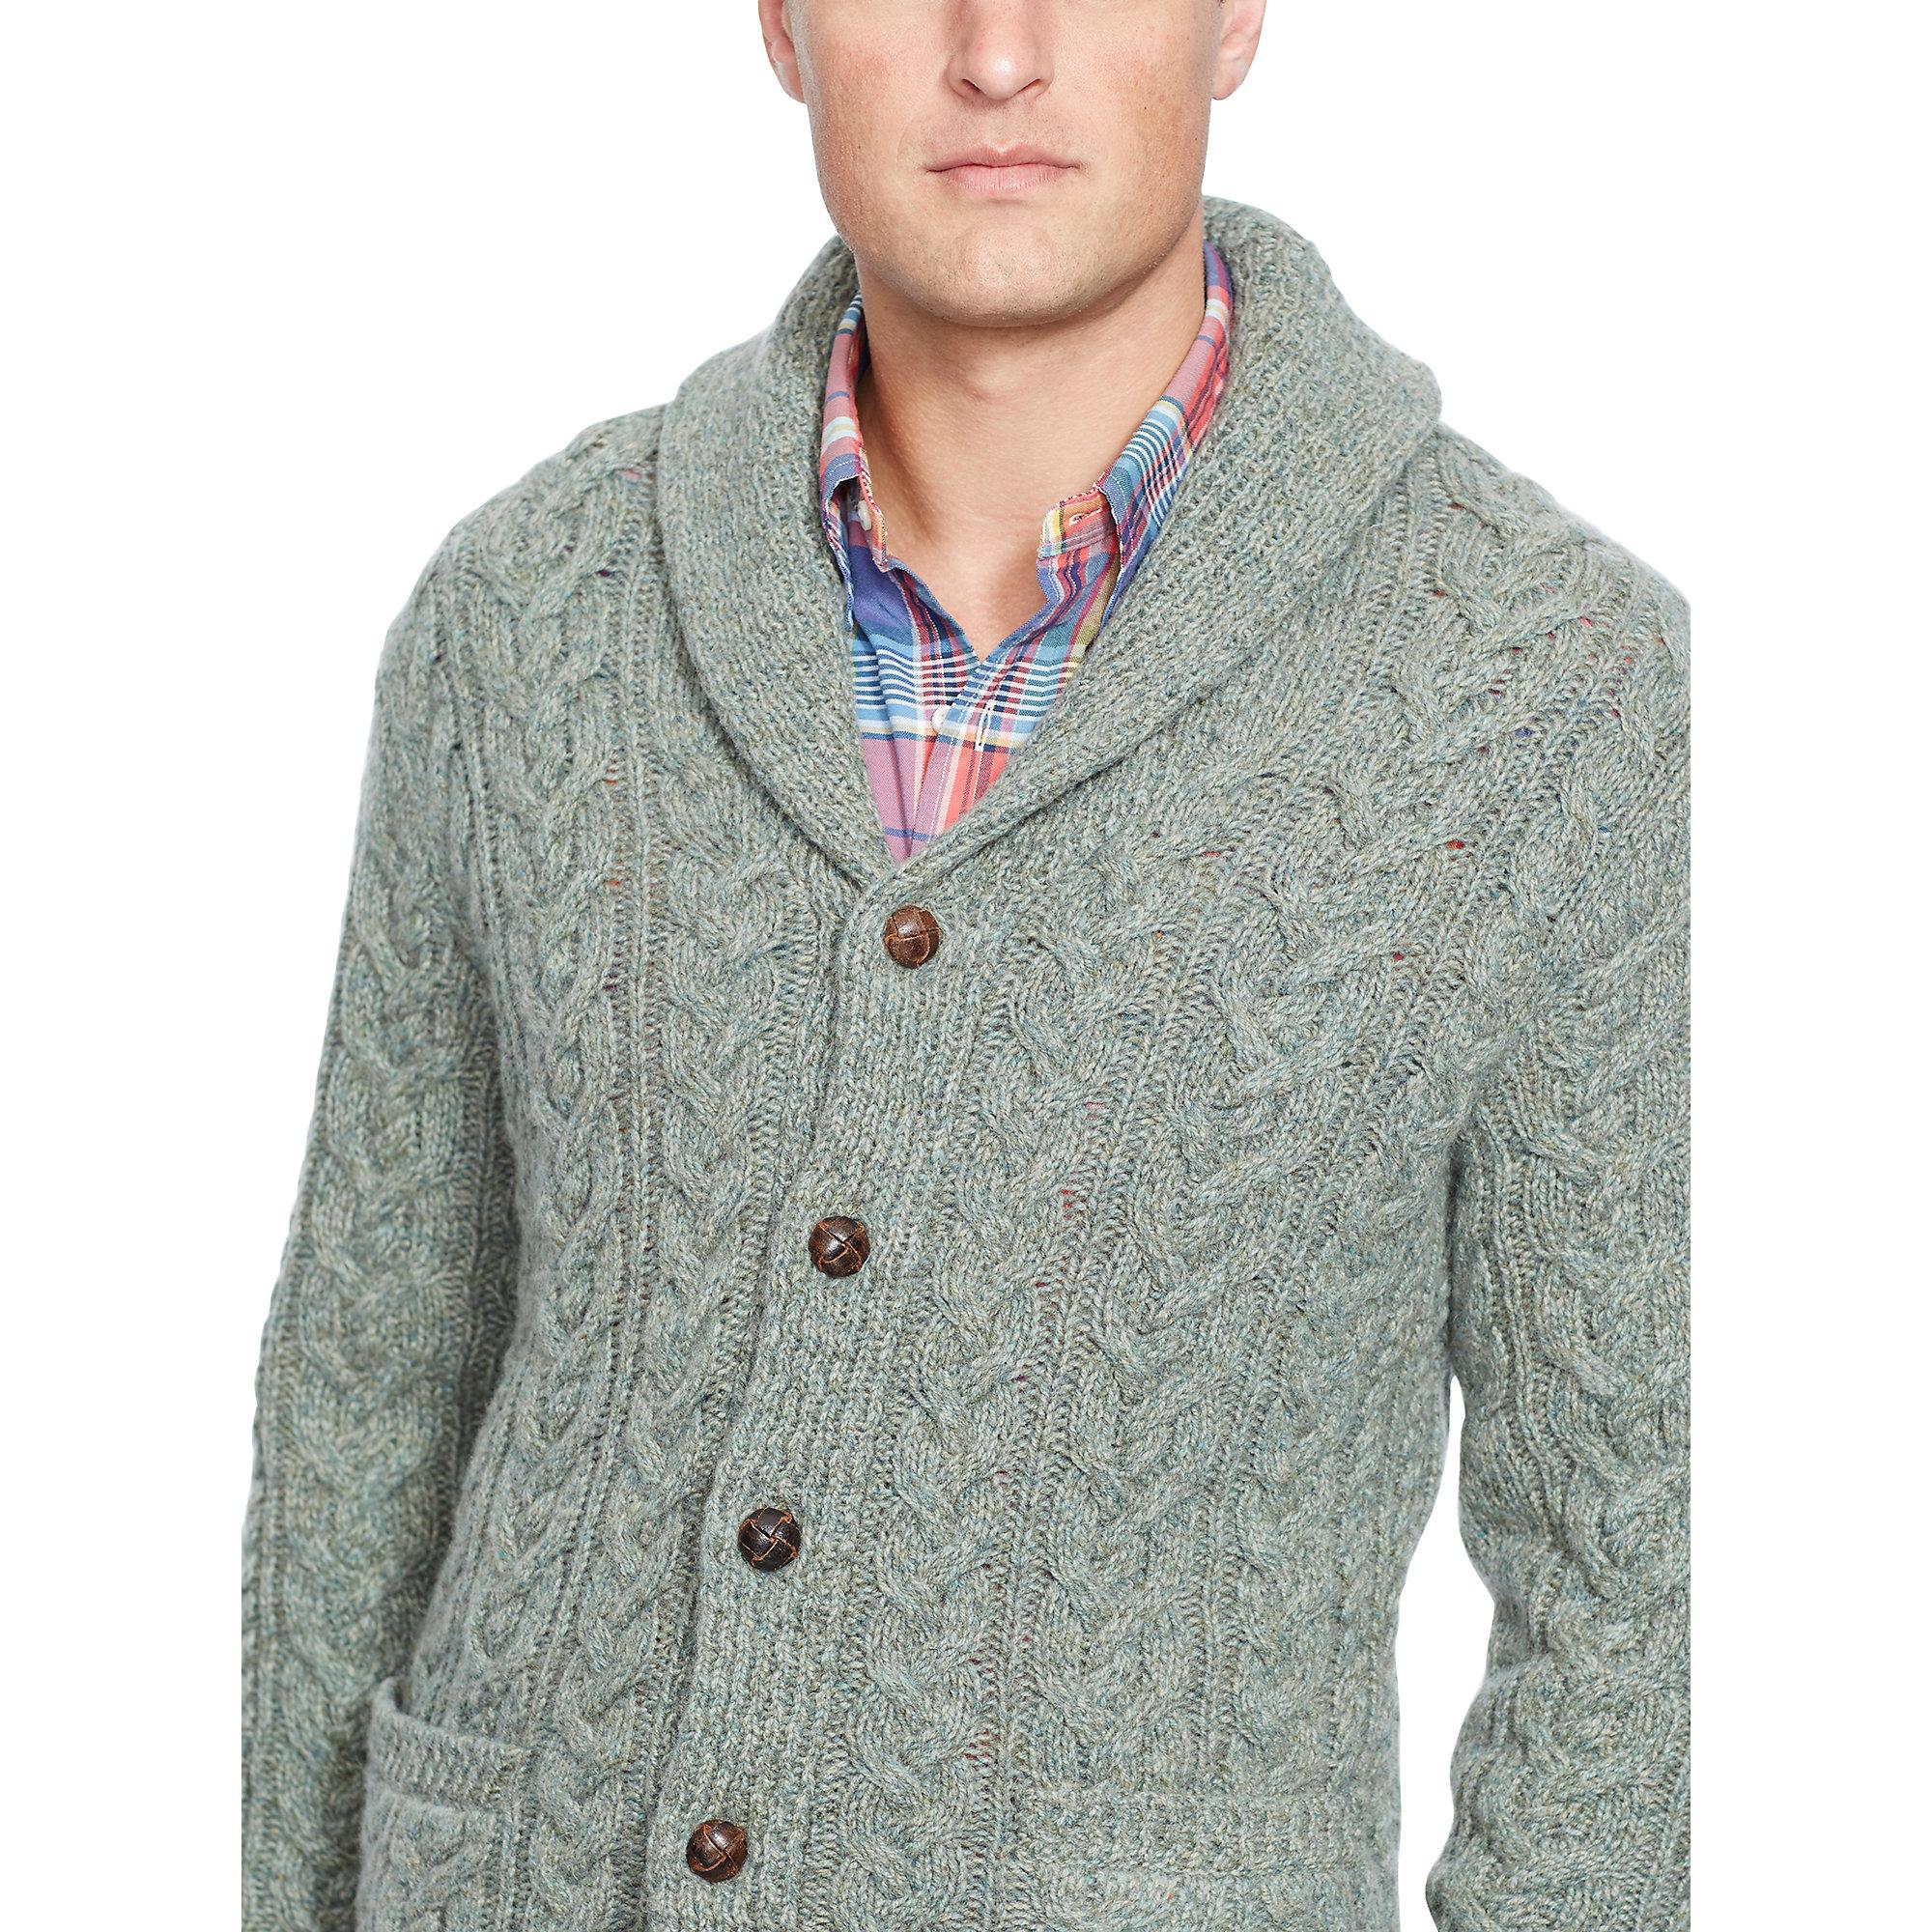 9d4c50724 Polo Ralph Lauren Wool-cashmere Cardigan in Green for Men - Lyst